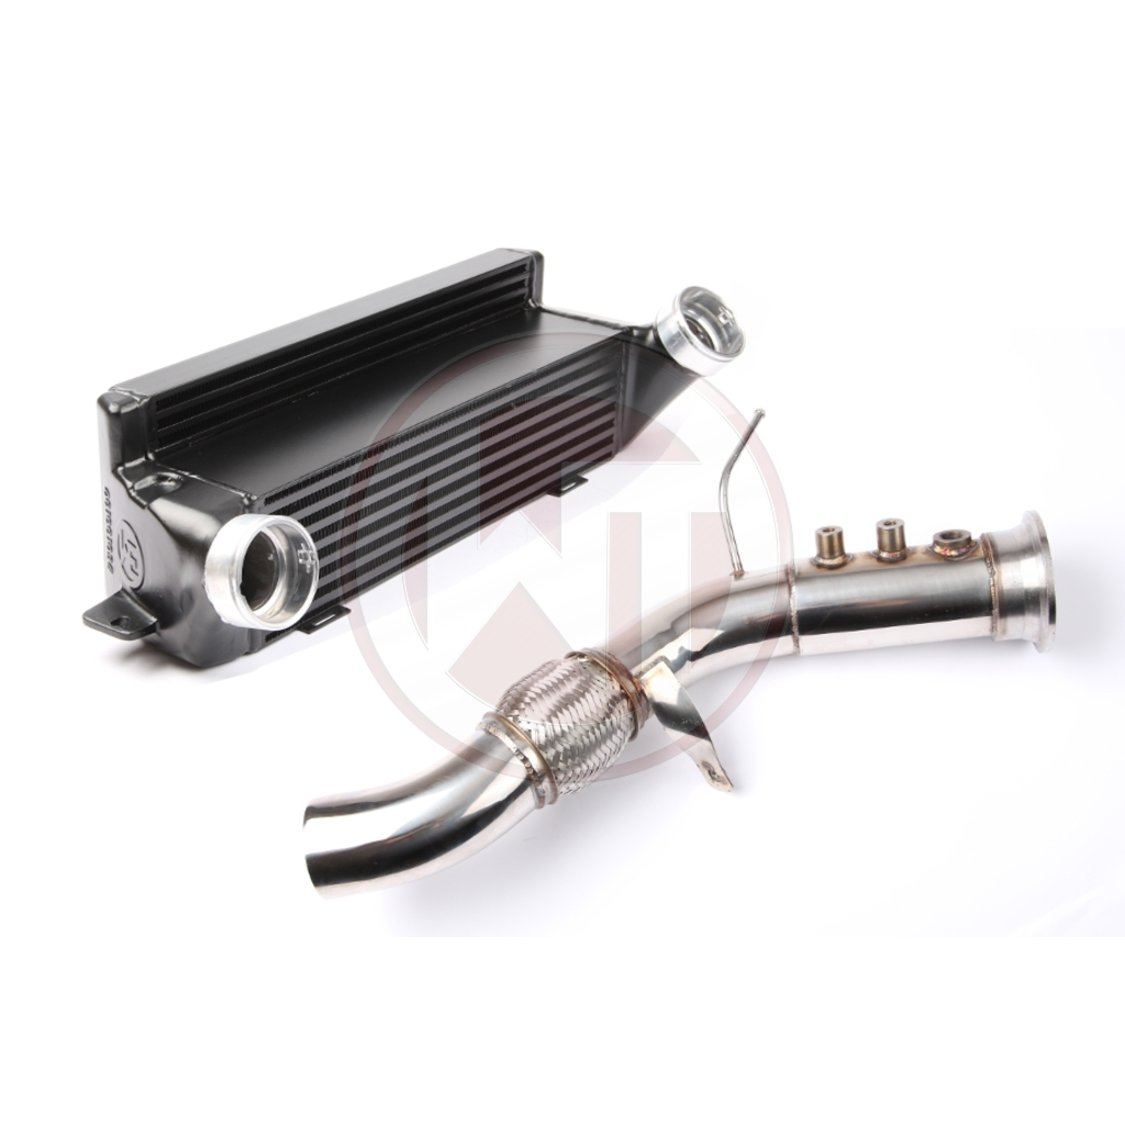 wagner-bmw-e90-335d-performance-tuning-intercooler-kit.jpg